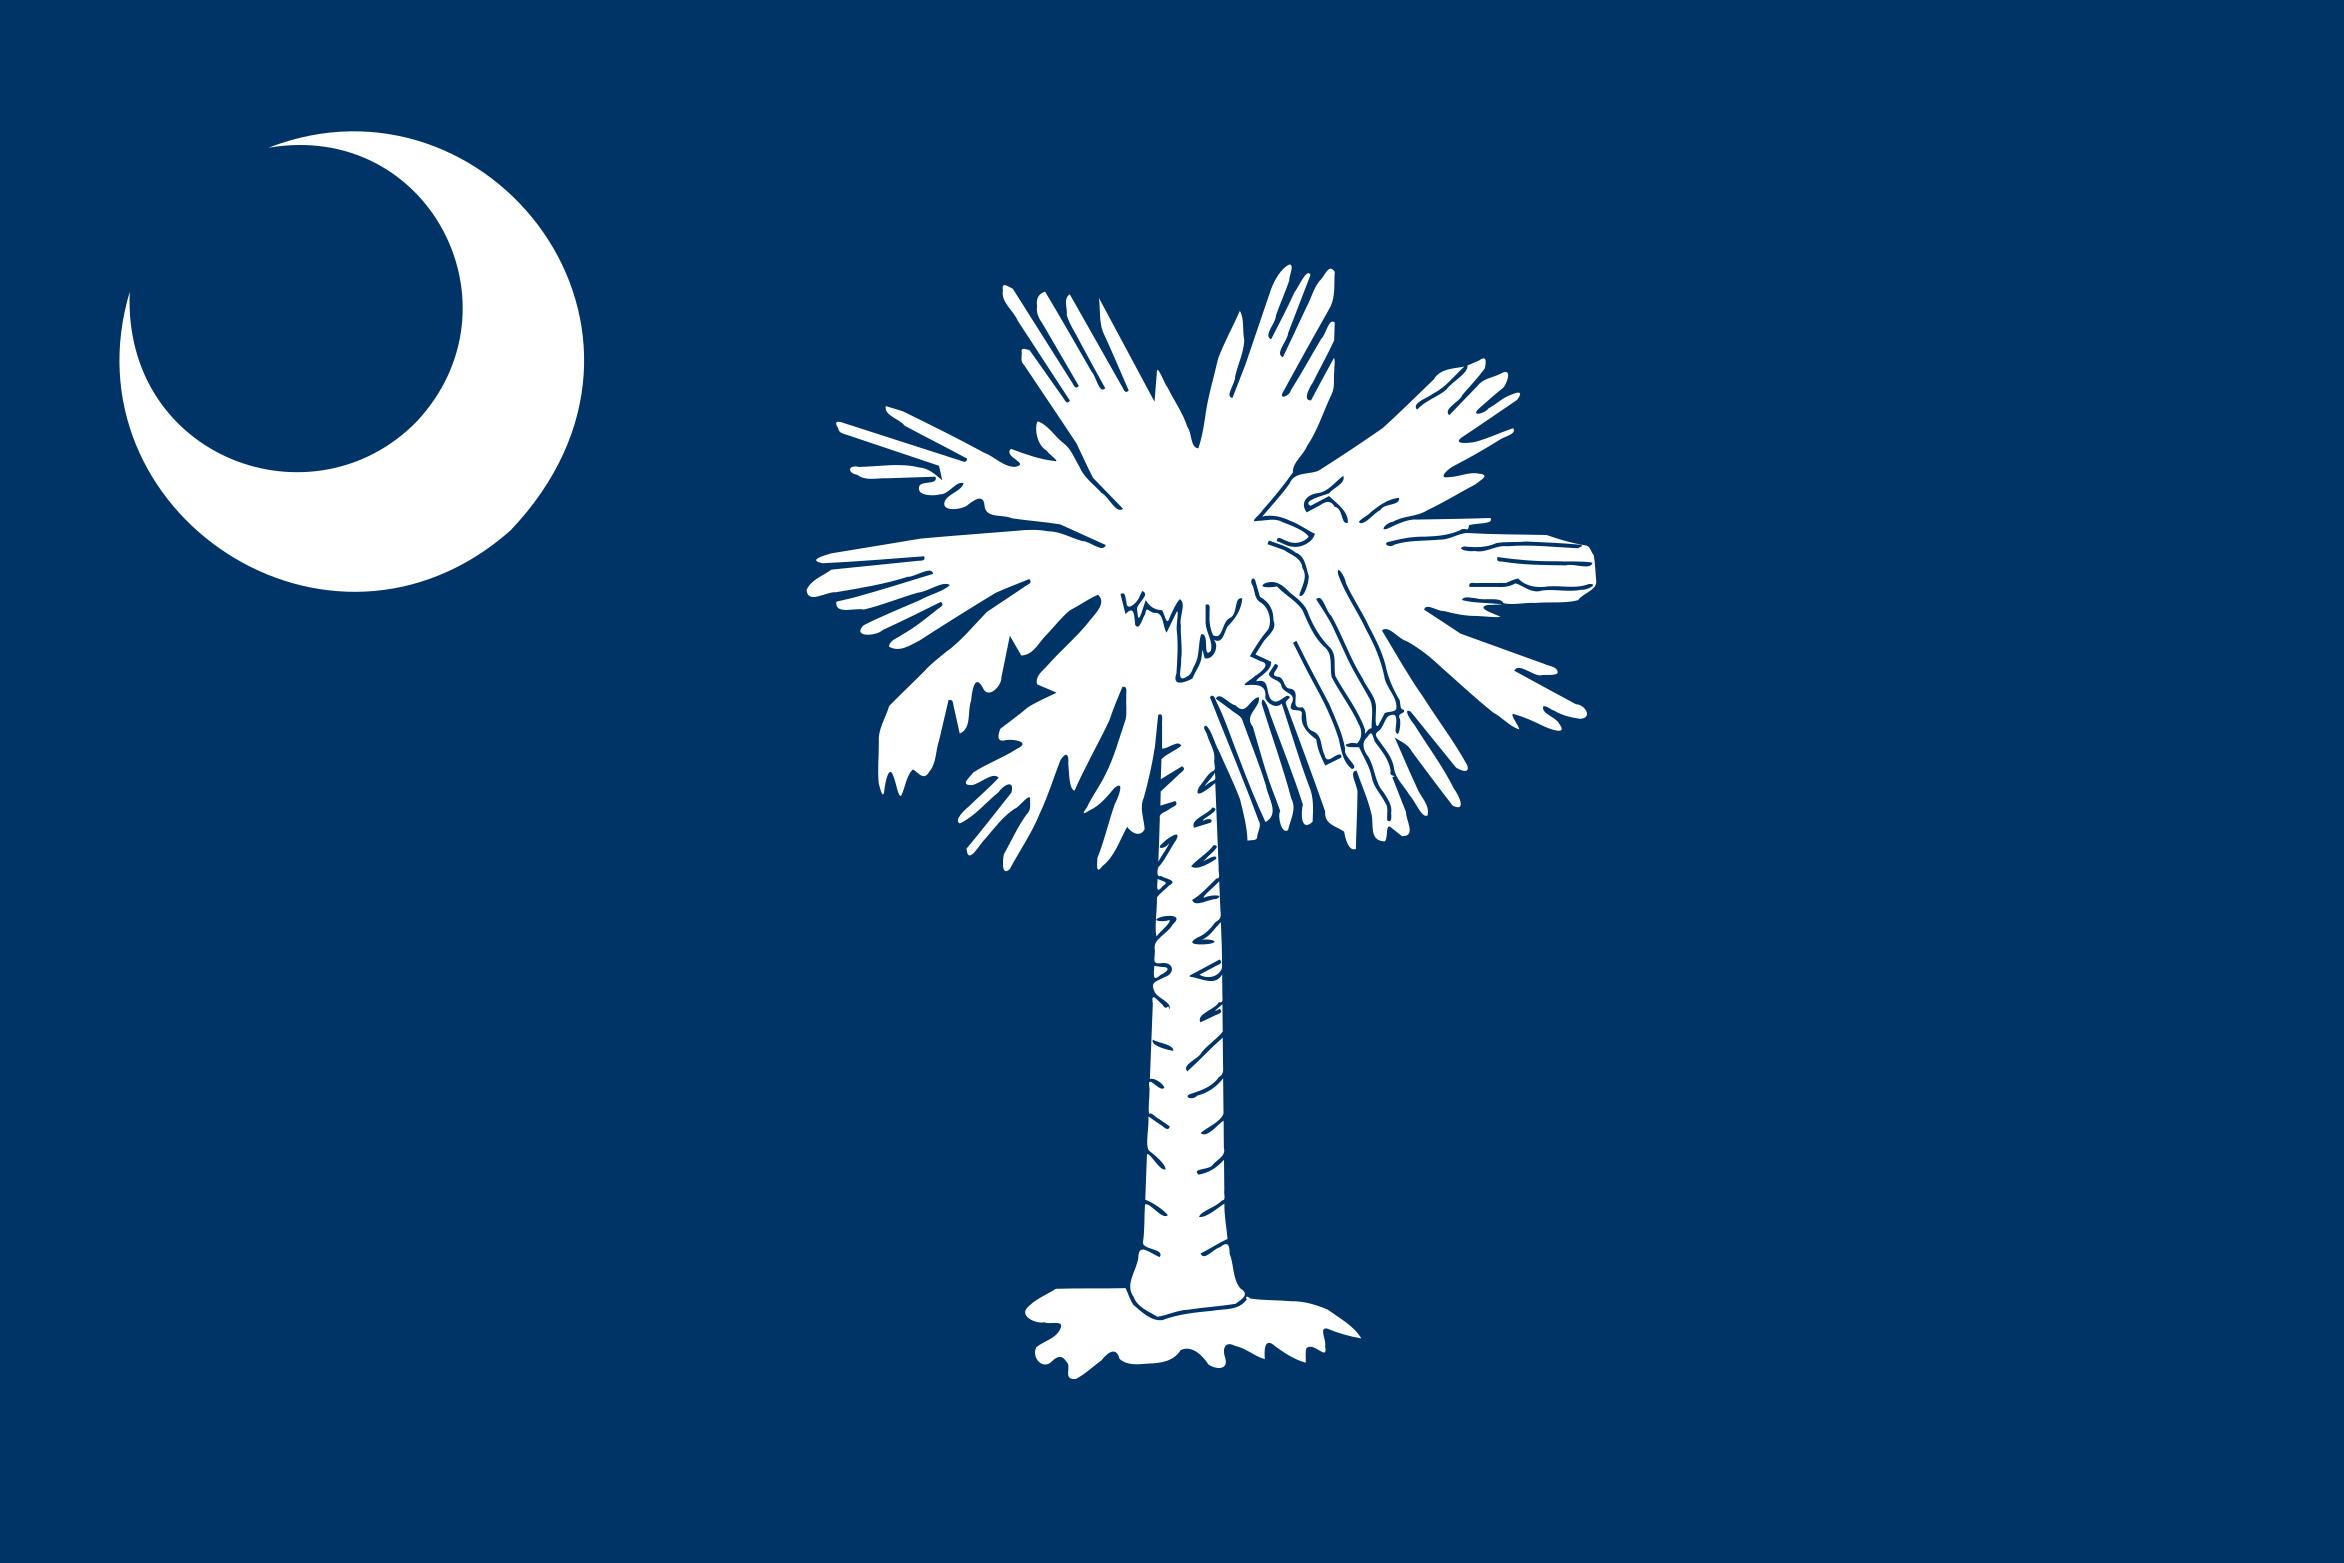 South_Carolina State Flag Colors